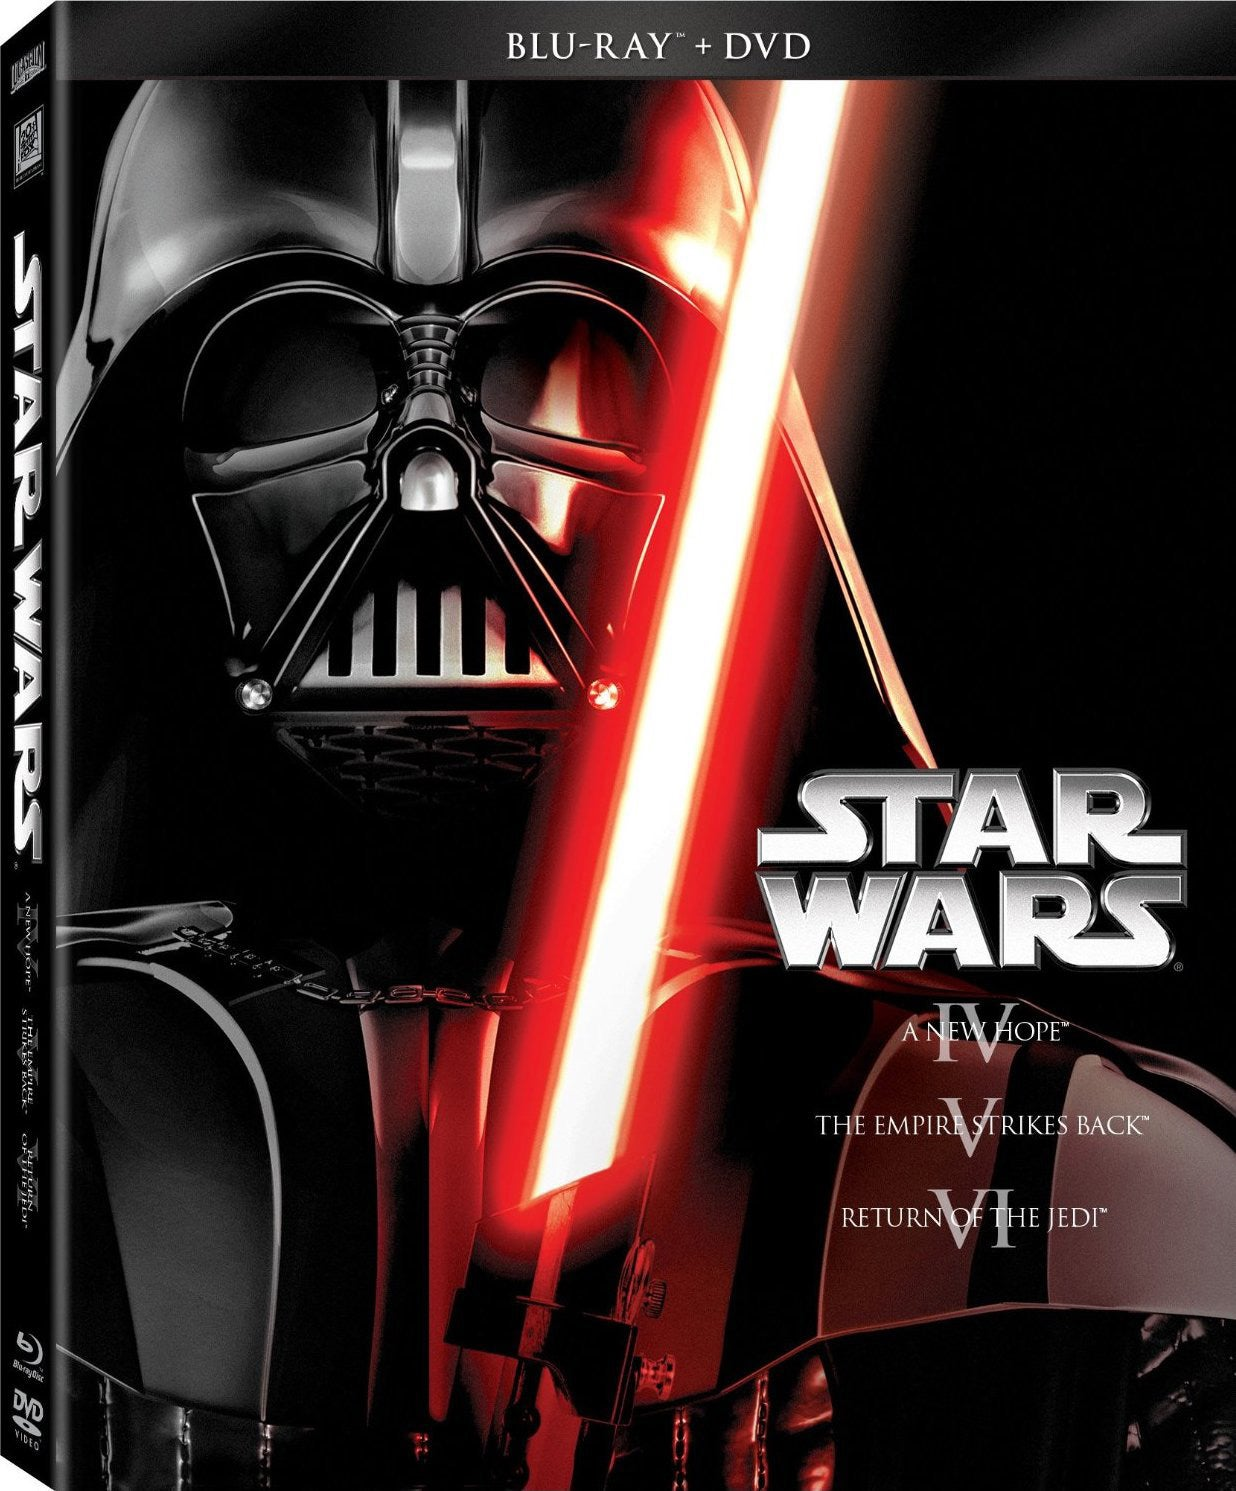 Star Wars Trilogy Episodes IV-VI (Blu-ray/DVD)